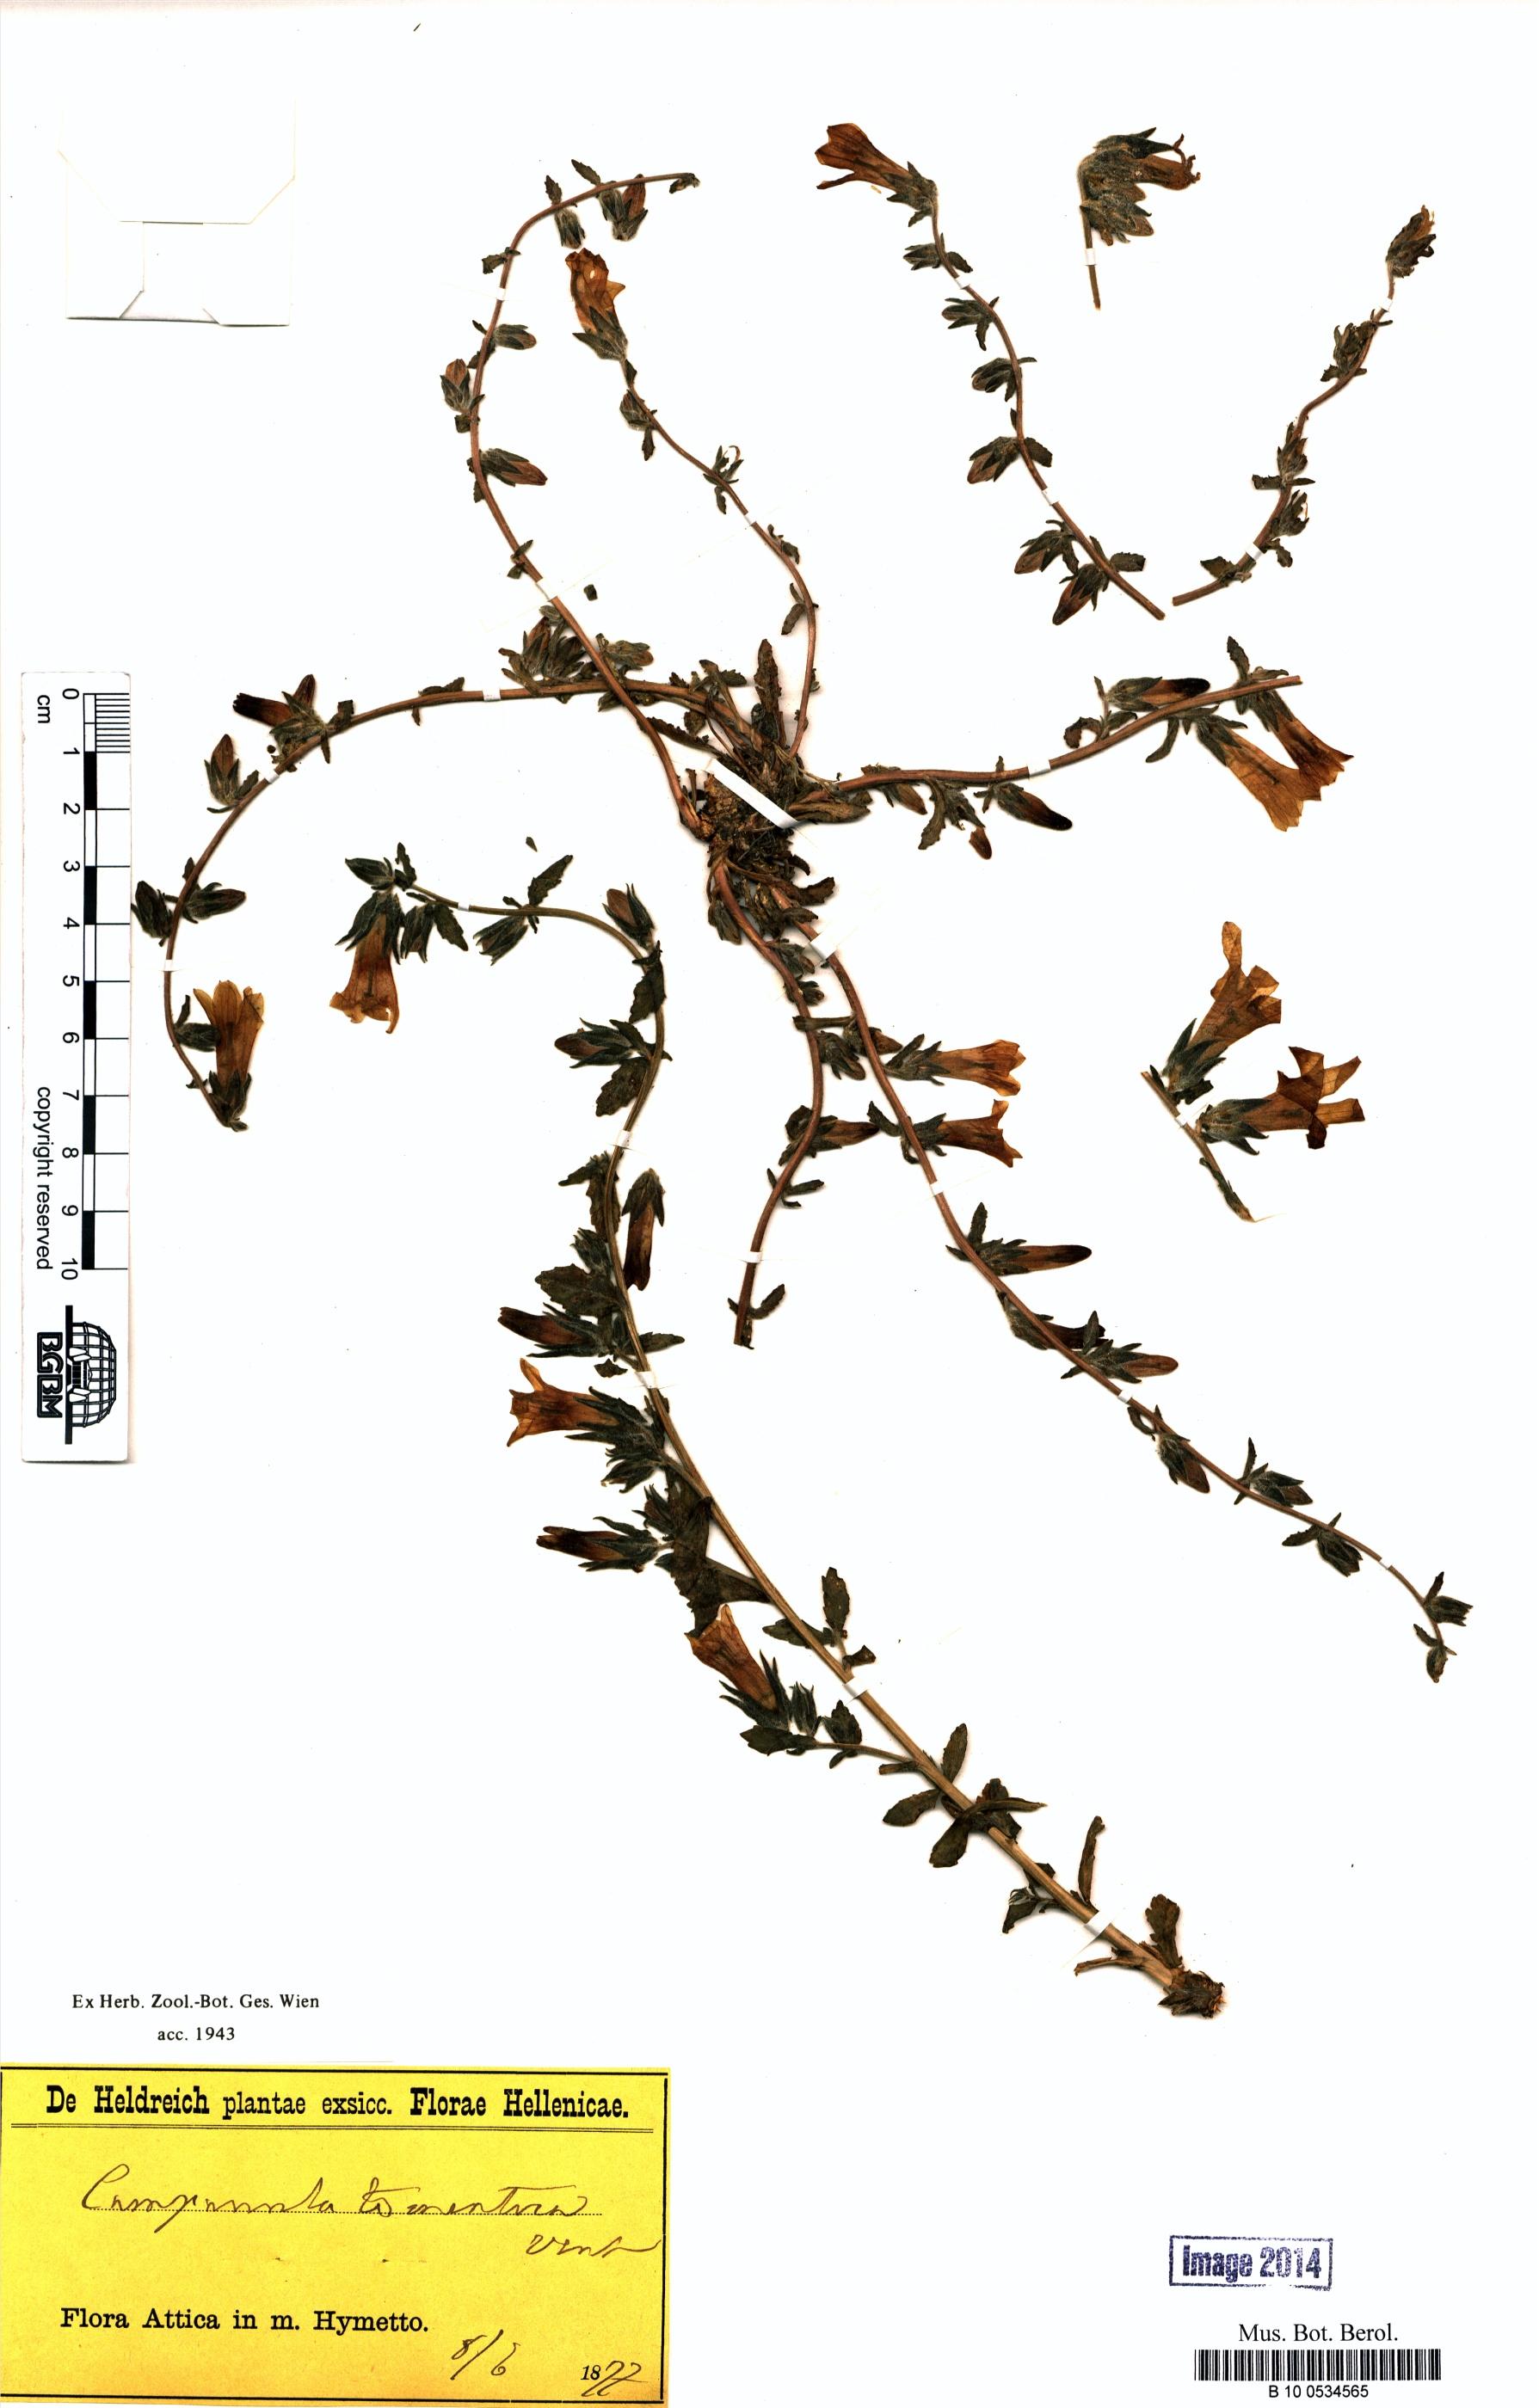 http://ww2.bgbm.org/herbarium/images/B/10/05/34/56/B_10_0534565.jpg